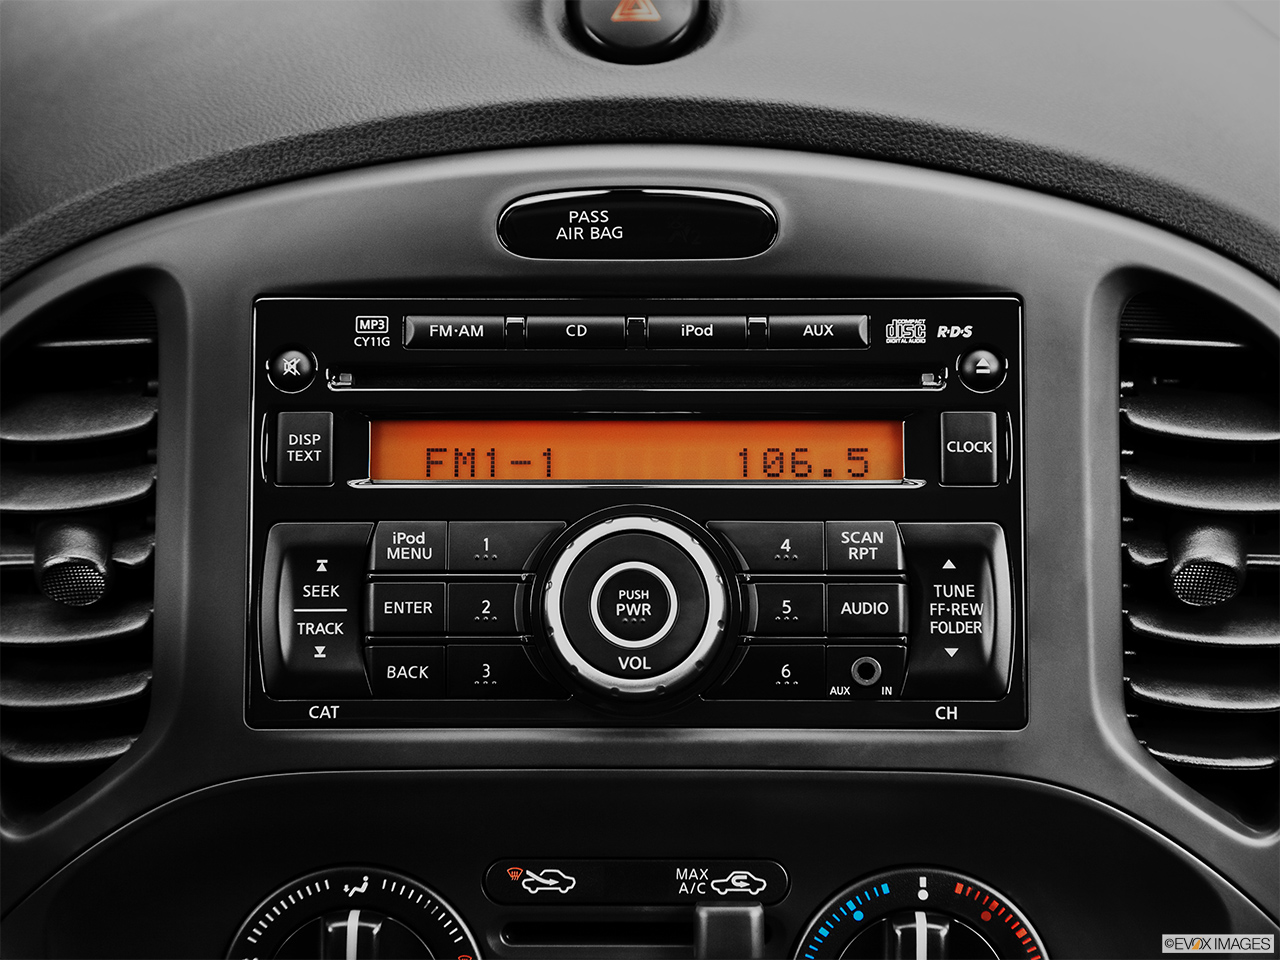 2014 Nissan Juke Wagon Cvt Nismo Rs Awd Closeup Of Radio